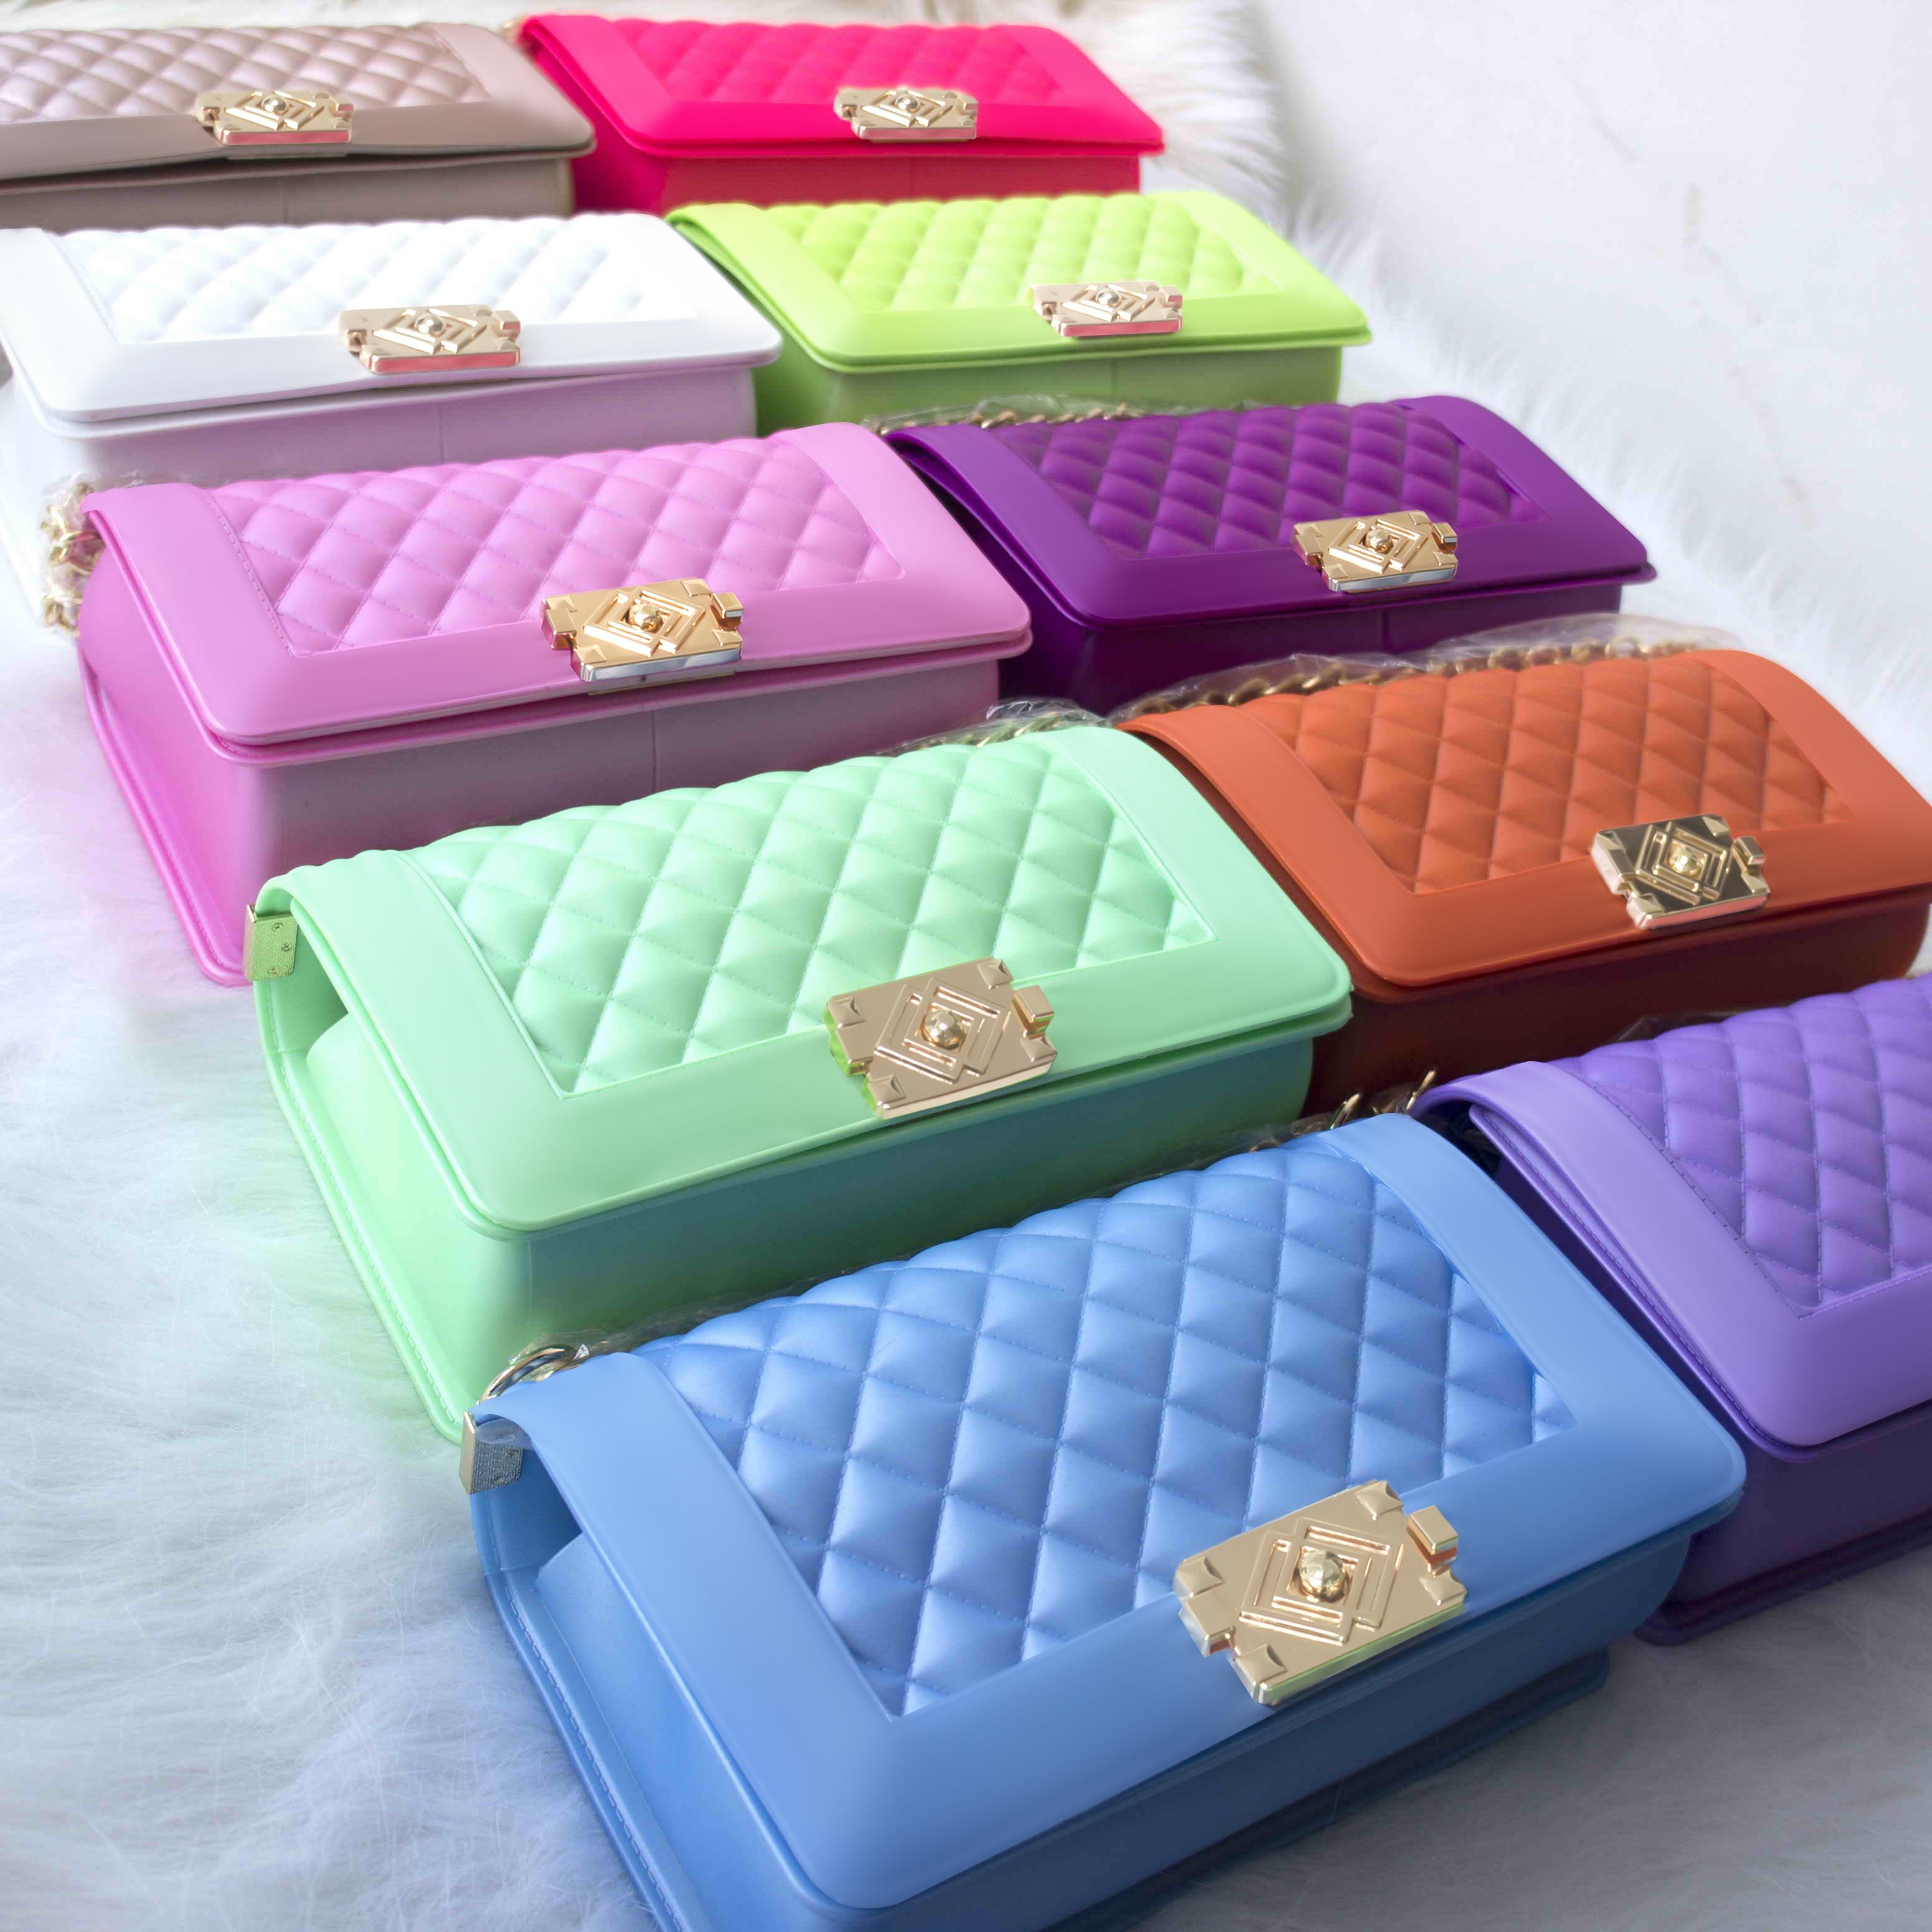 Lady handbag jelly shoulder bag colorful PVC bag trendy handbag fashion bag tote shoulder handbag for women